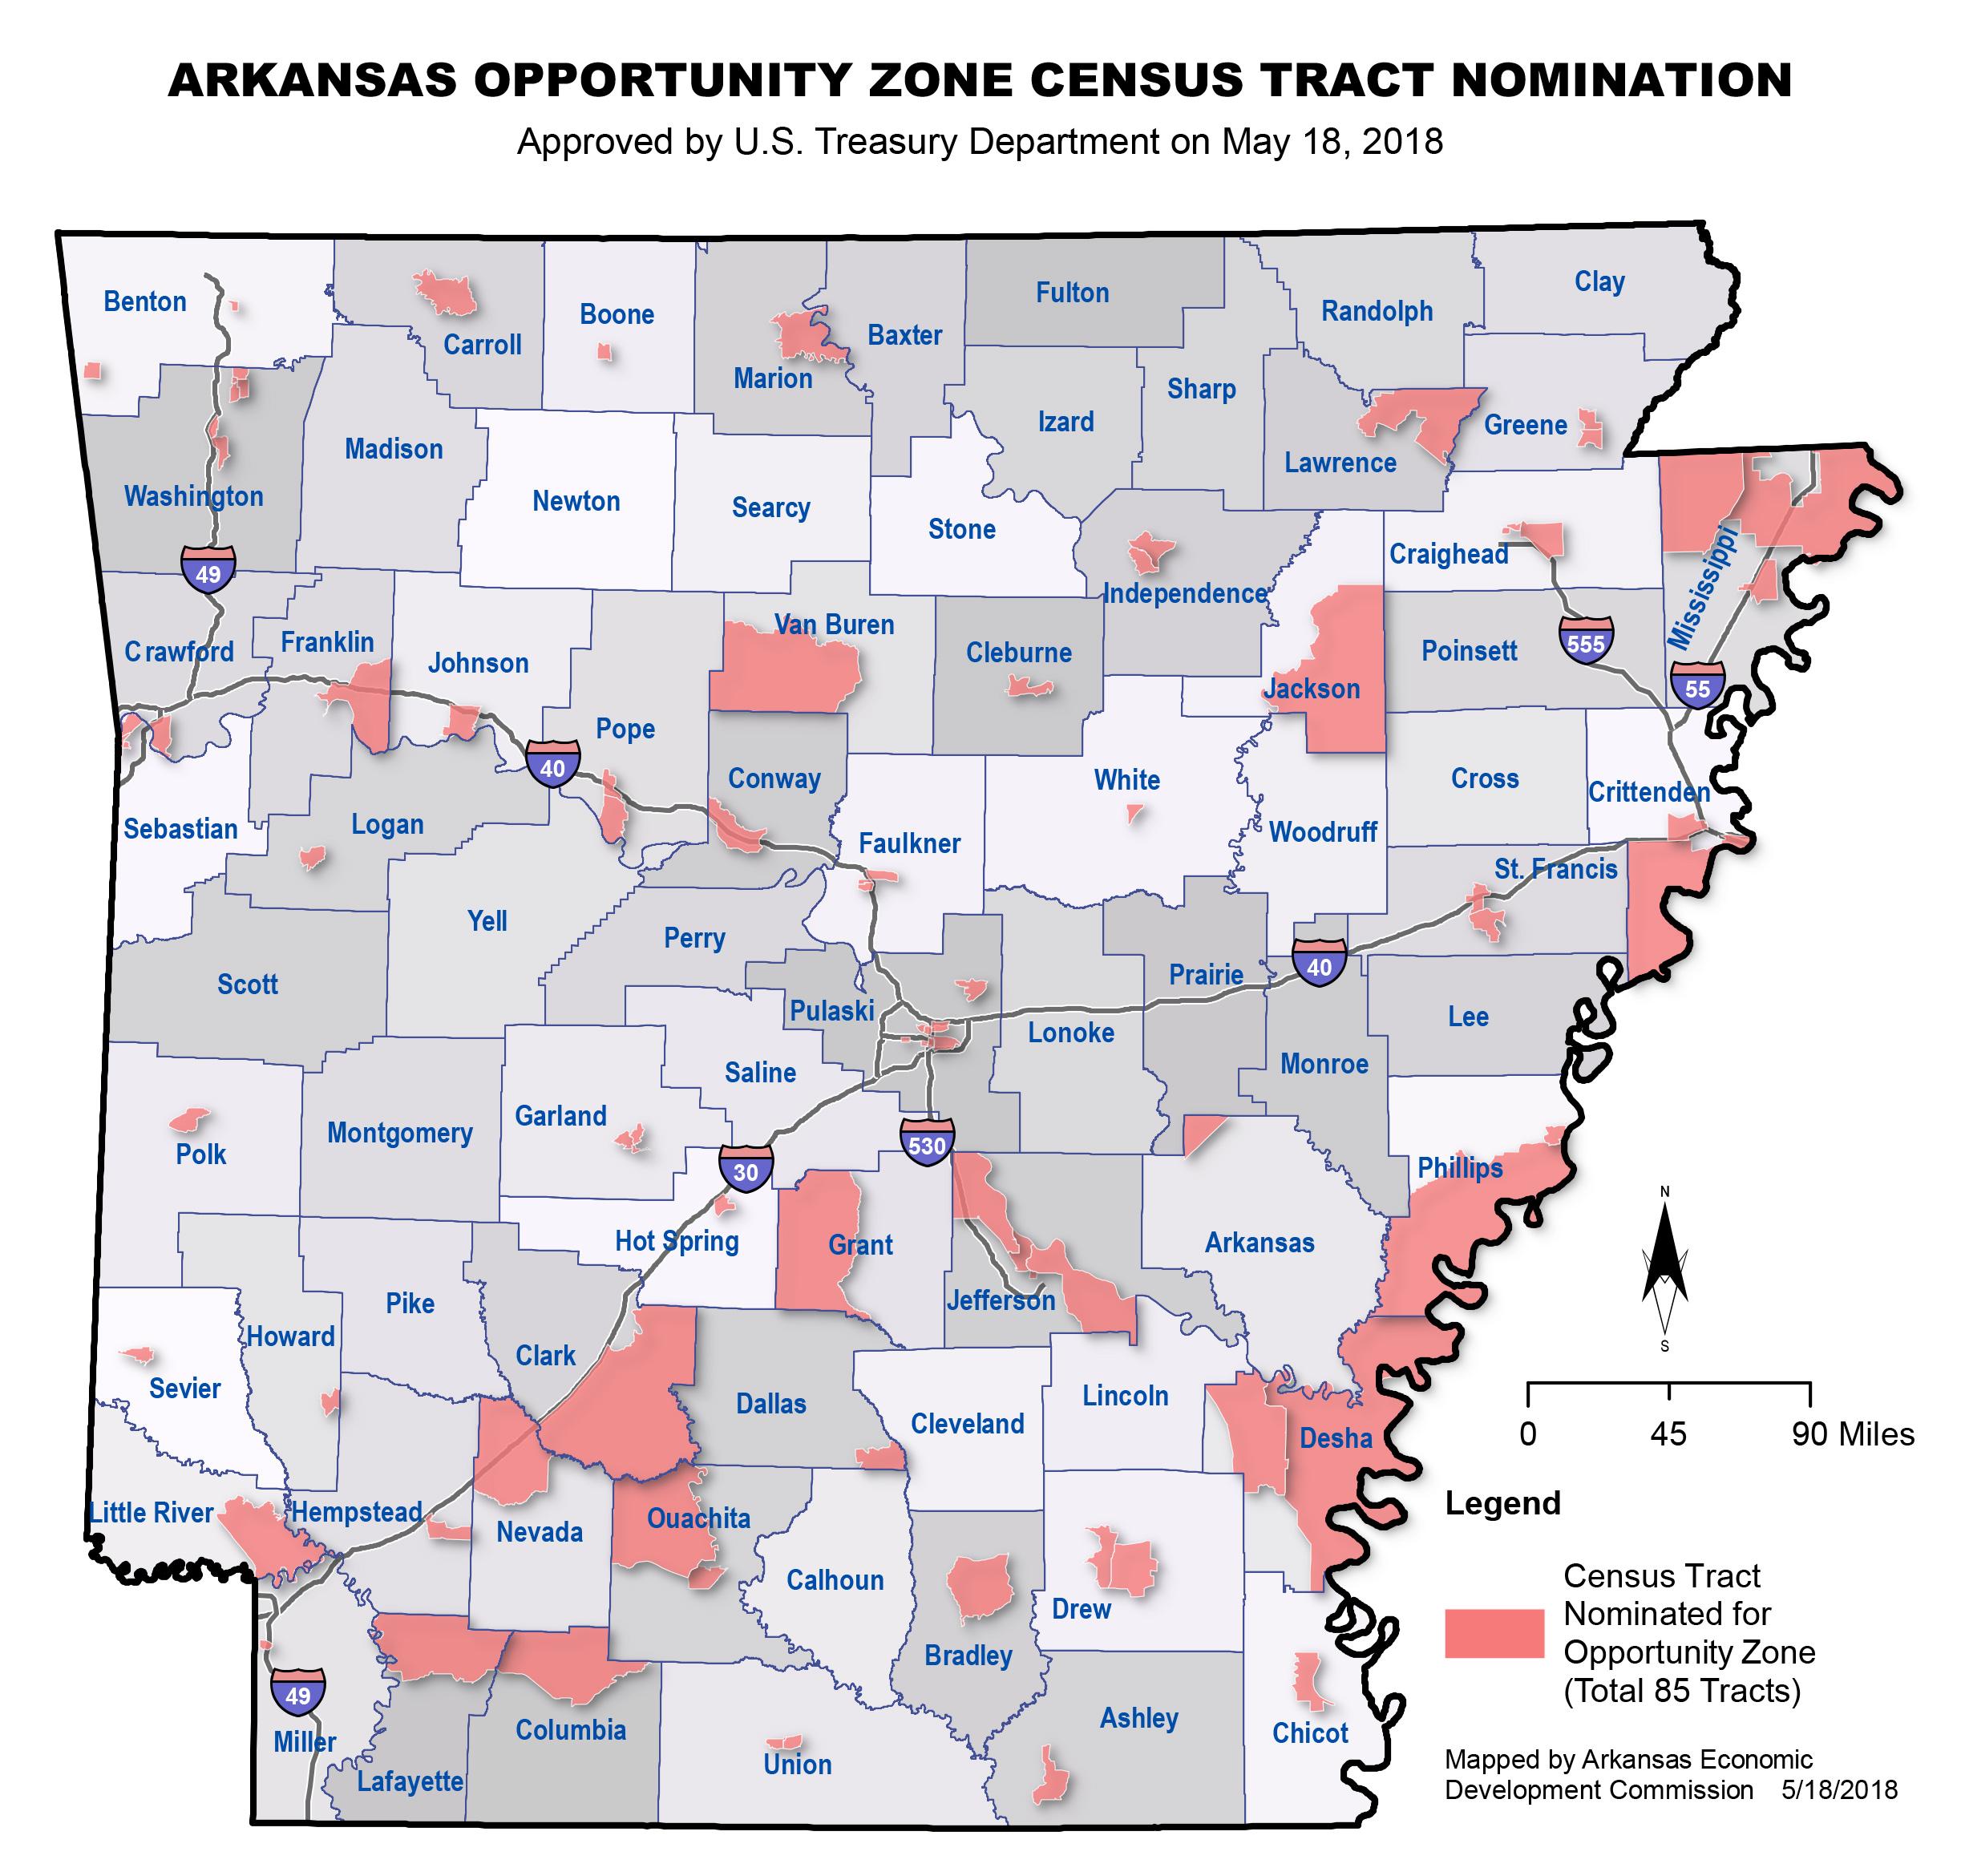 Arkansas Opportunity Zones is a new incentive for ... on map of connecticut, harrison arkansas, map of idaho, texarkana arkansas, map of north carolina, rivers in arkansas, map of georgia, map of michigan, map of texas, osceola arkansas, map of new jersey, map of ohio, russellville arkansas, ash flat arkansas, map of alabama, map of colorado, google maps arkansas, piggott arkansas, murfreesboro arkansas, fairfield bay arkansas, jonesboro arkansas, map of africa, dewitt arkansas, ozark arkansas, fort smith arkansas, map of hawaii, map of new york, map of alaska, map of illinois, white river arkansas, england arkansas, map of florida, cities in arkansas, helena arkansas, map of arizona, map of virginia, map of delaware, waldron arkansas, west memphis arkansas,